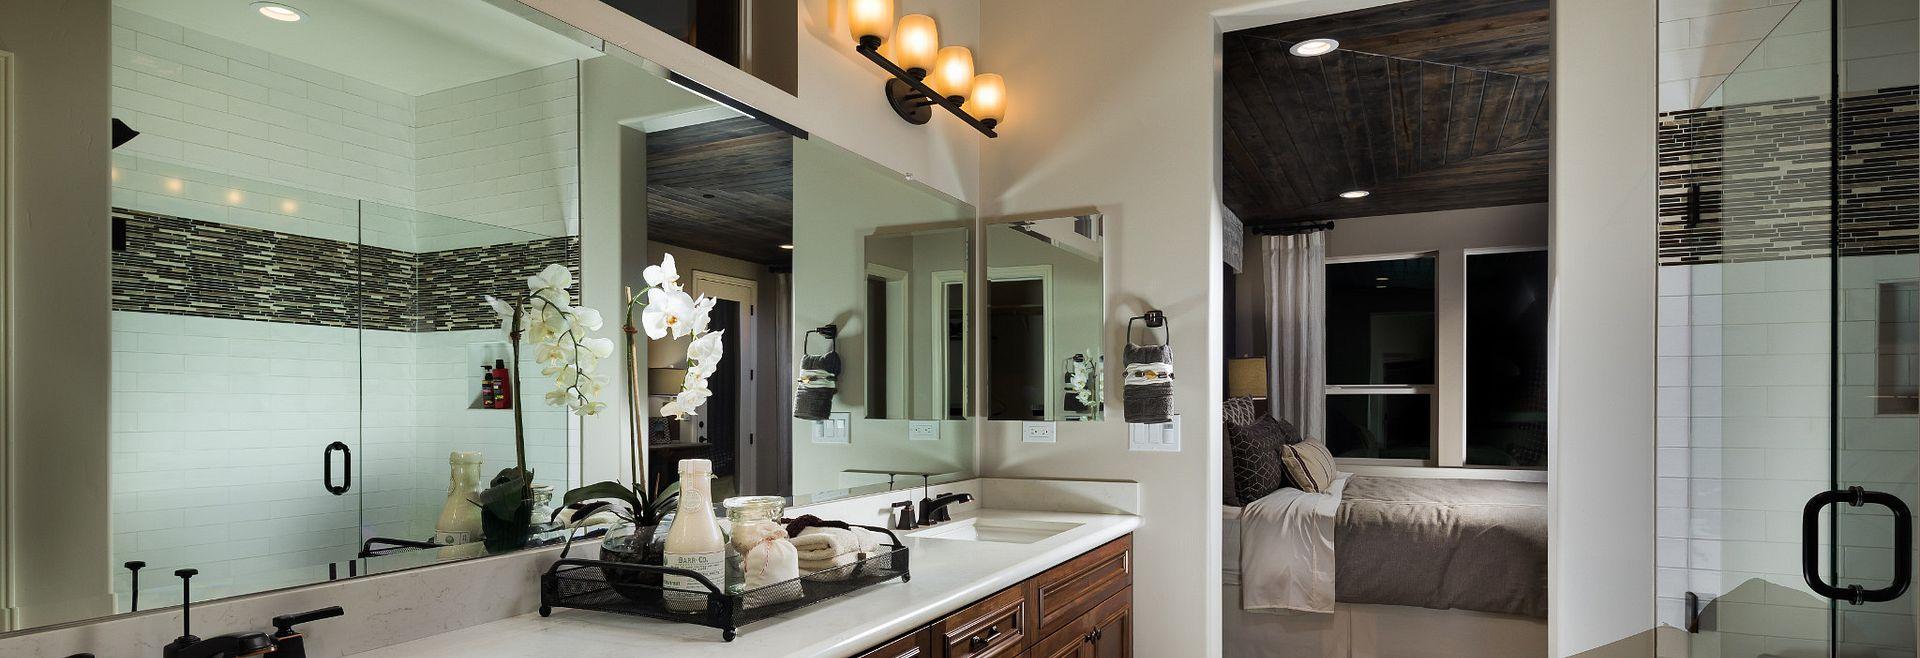 Trilogy Monarch Dunes Monterey Master Bathroom